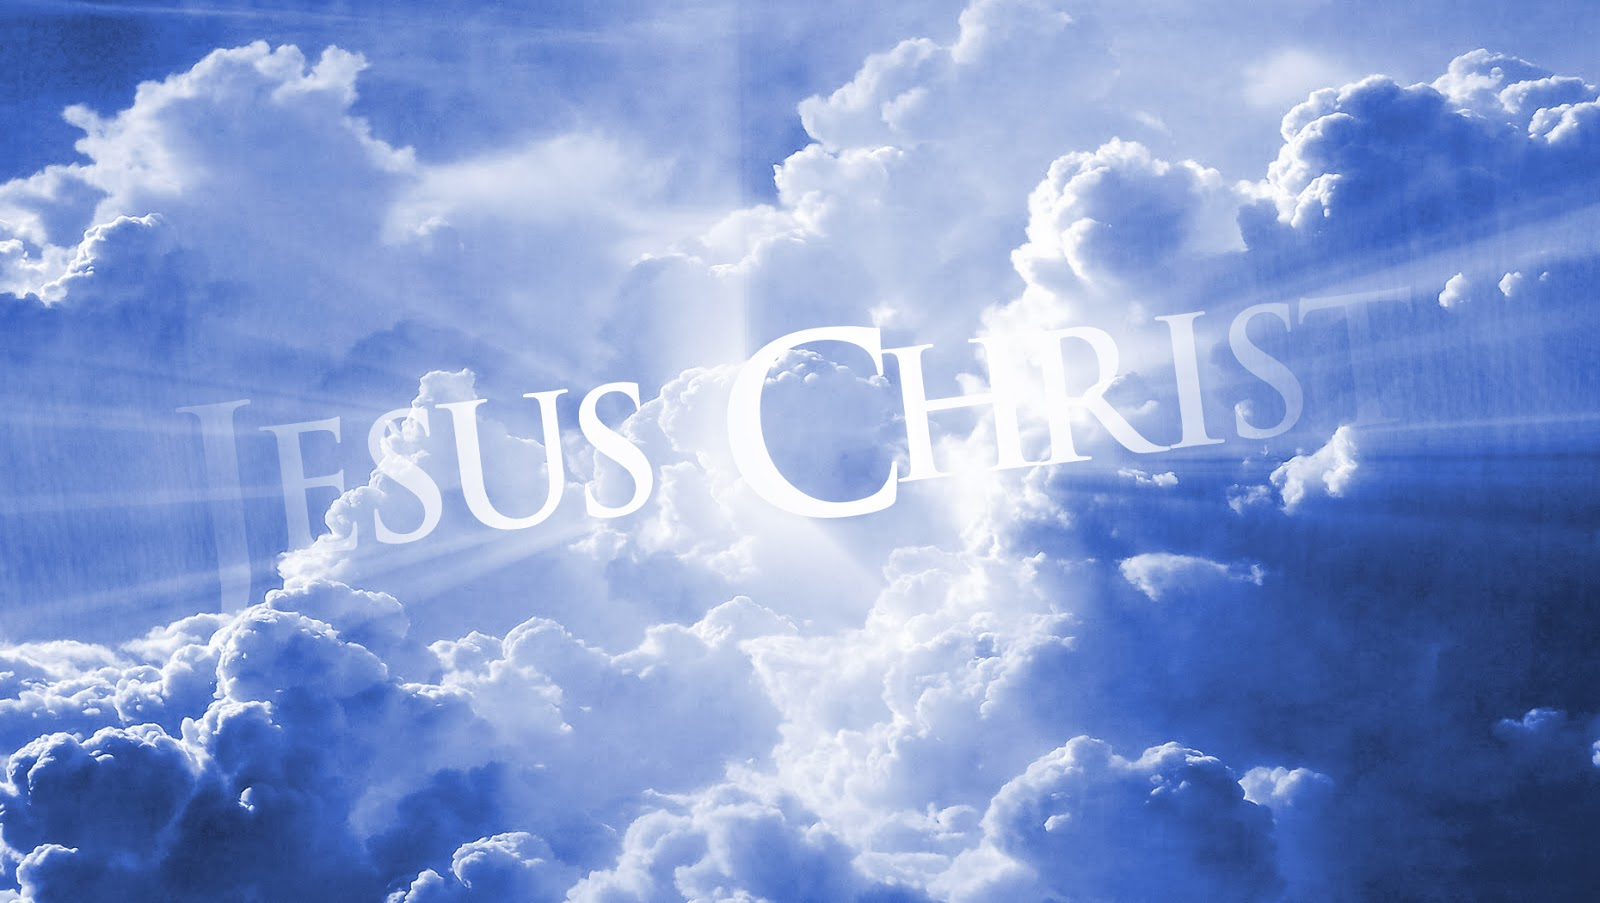 Jesus Christ wallpapers Christians photos 1600x903